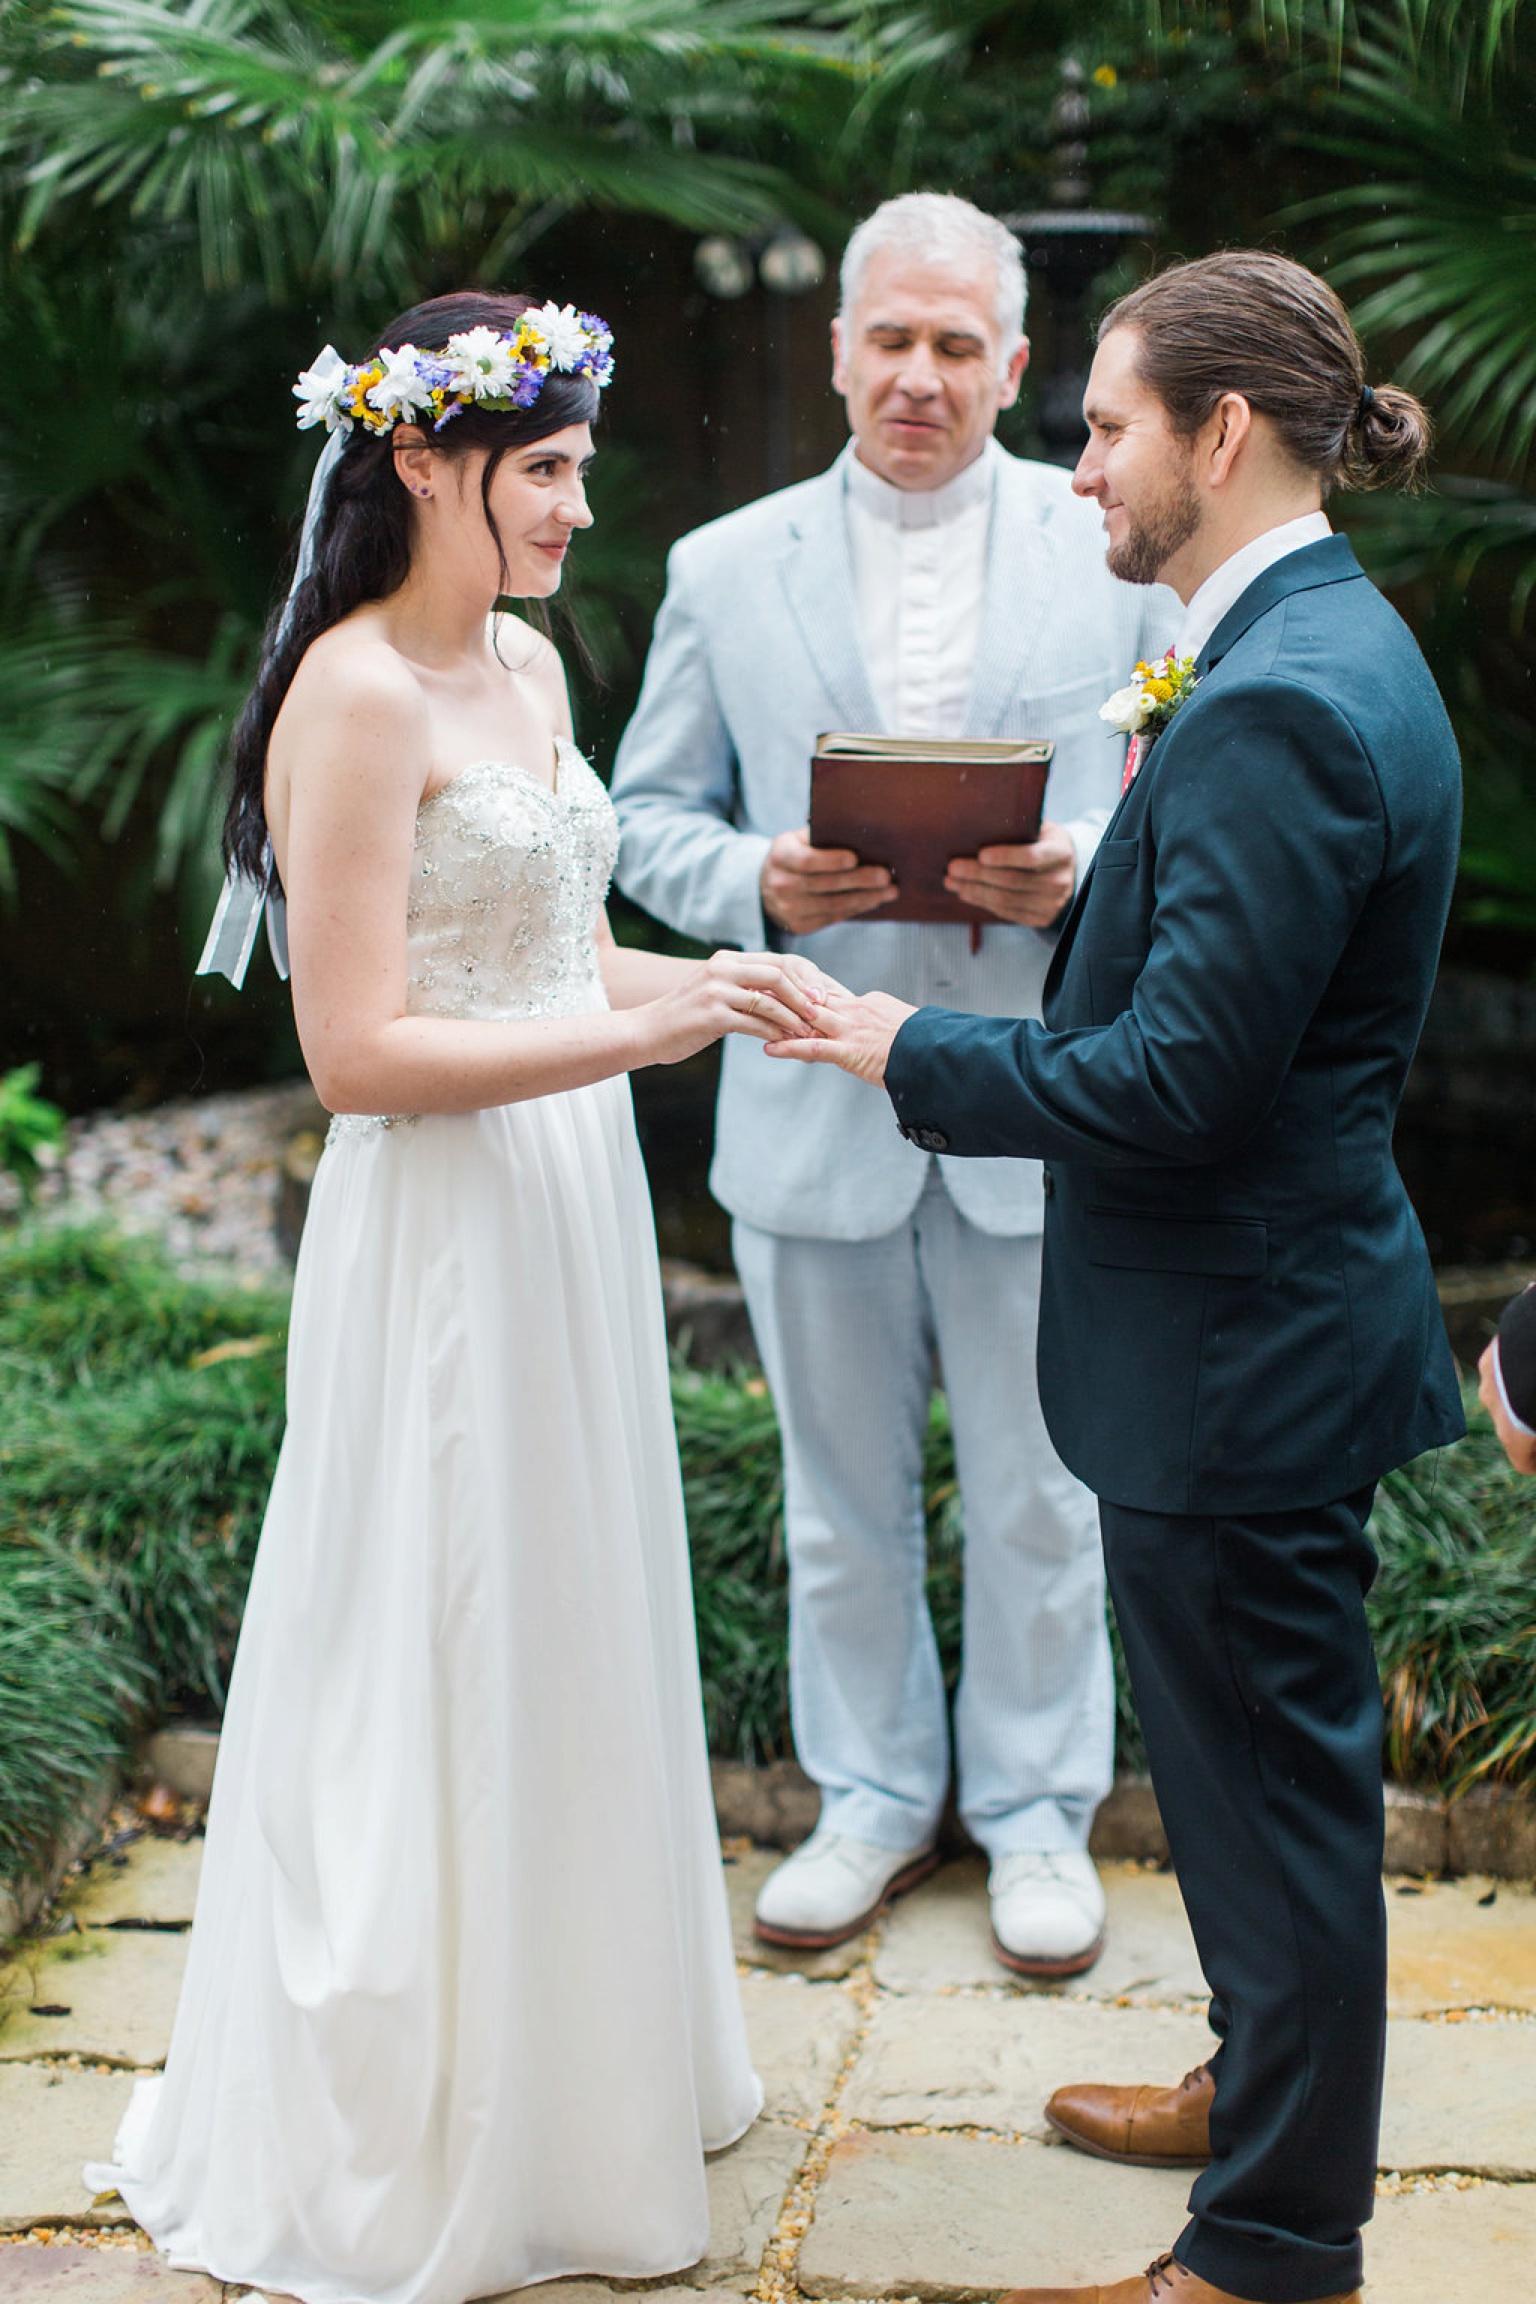 Apt_B_Photo_Savannah_Wedding_Photographer_Flower_Crown029.JPG